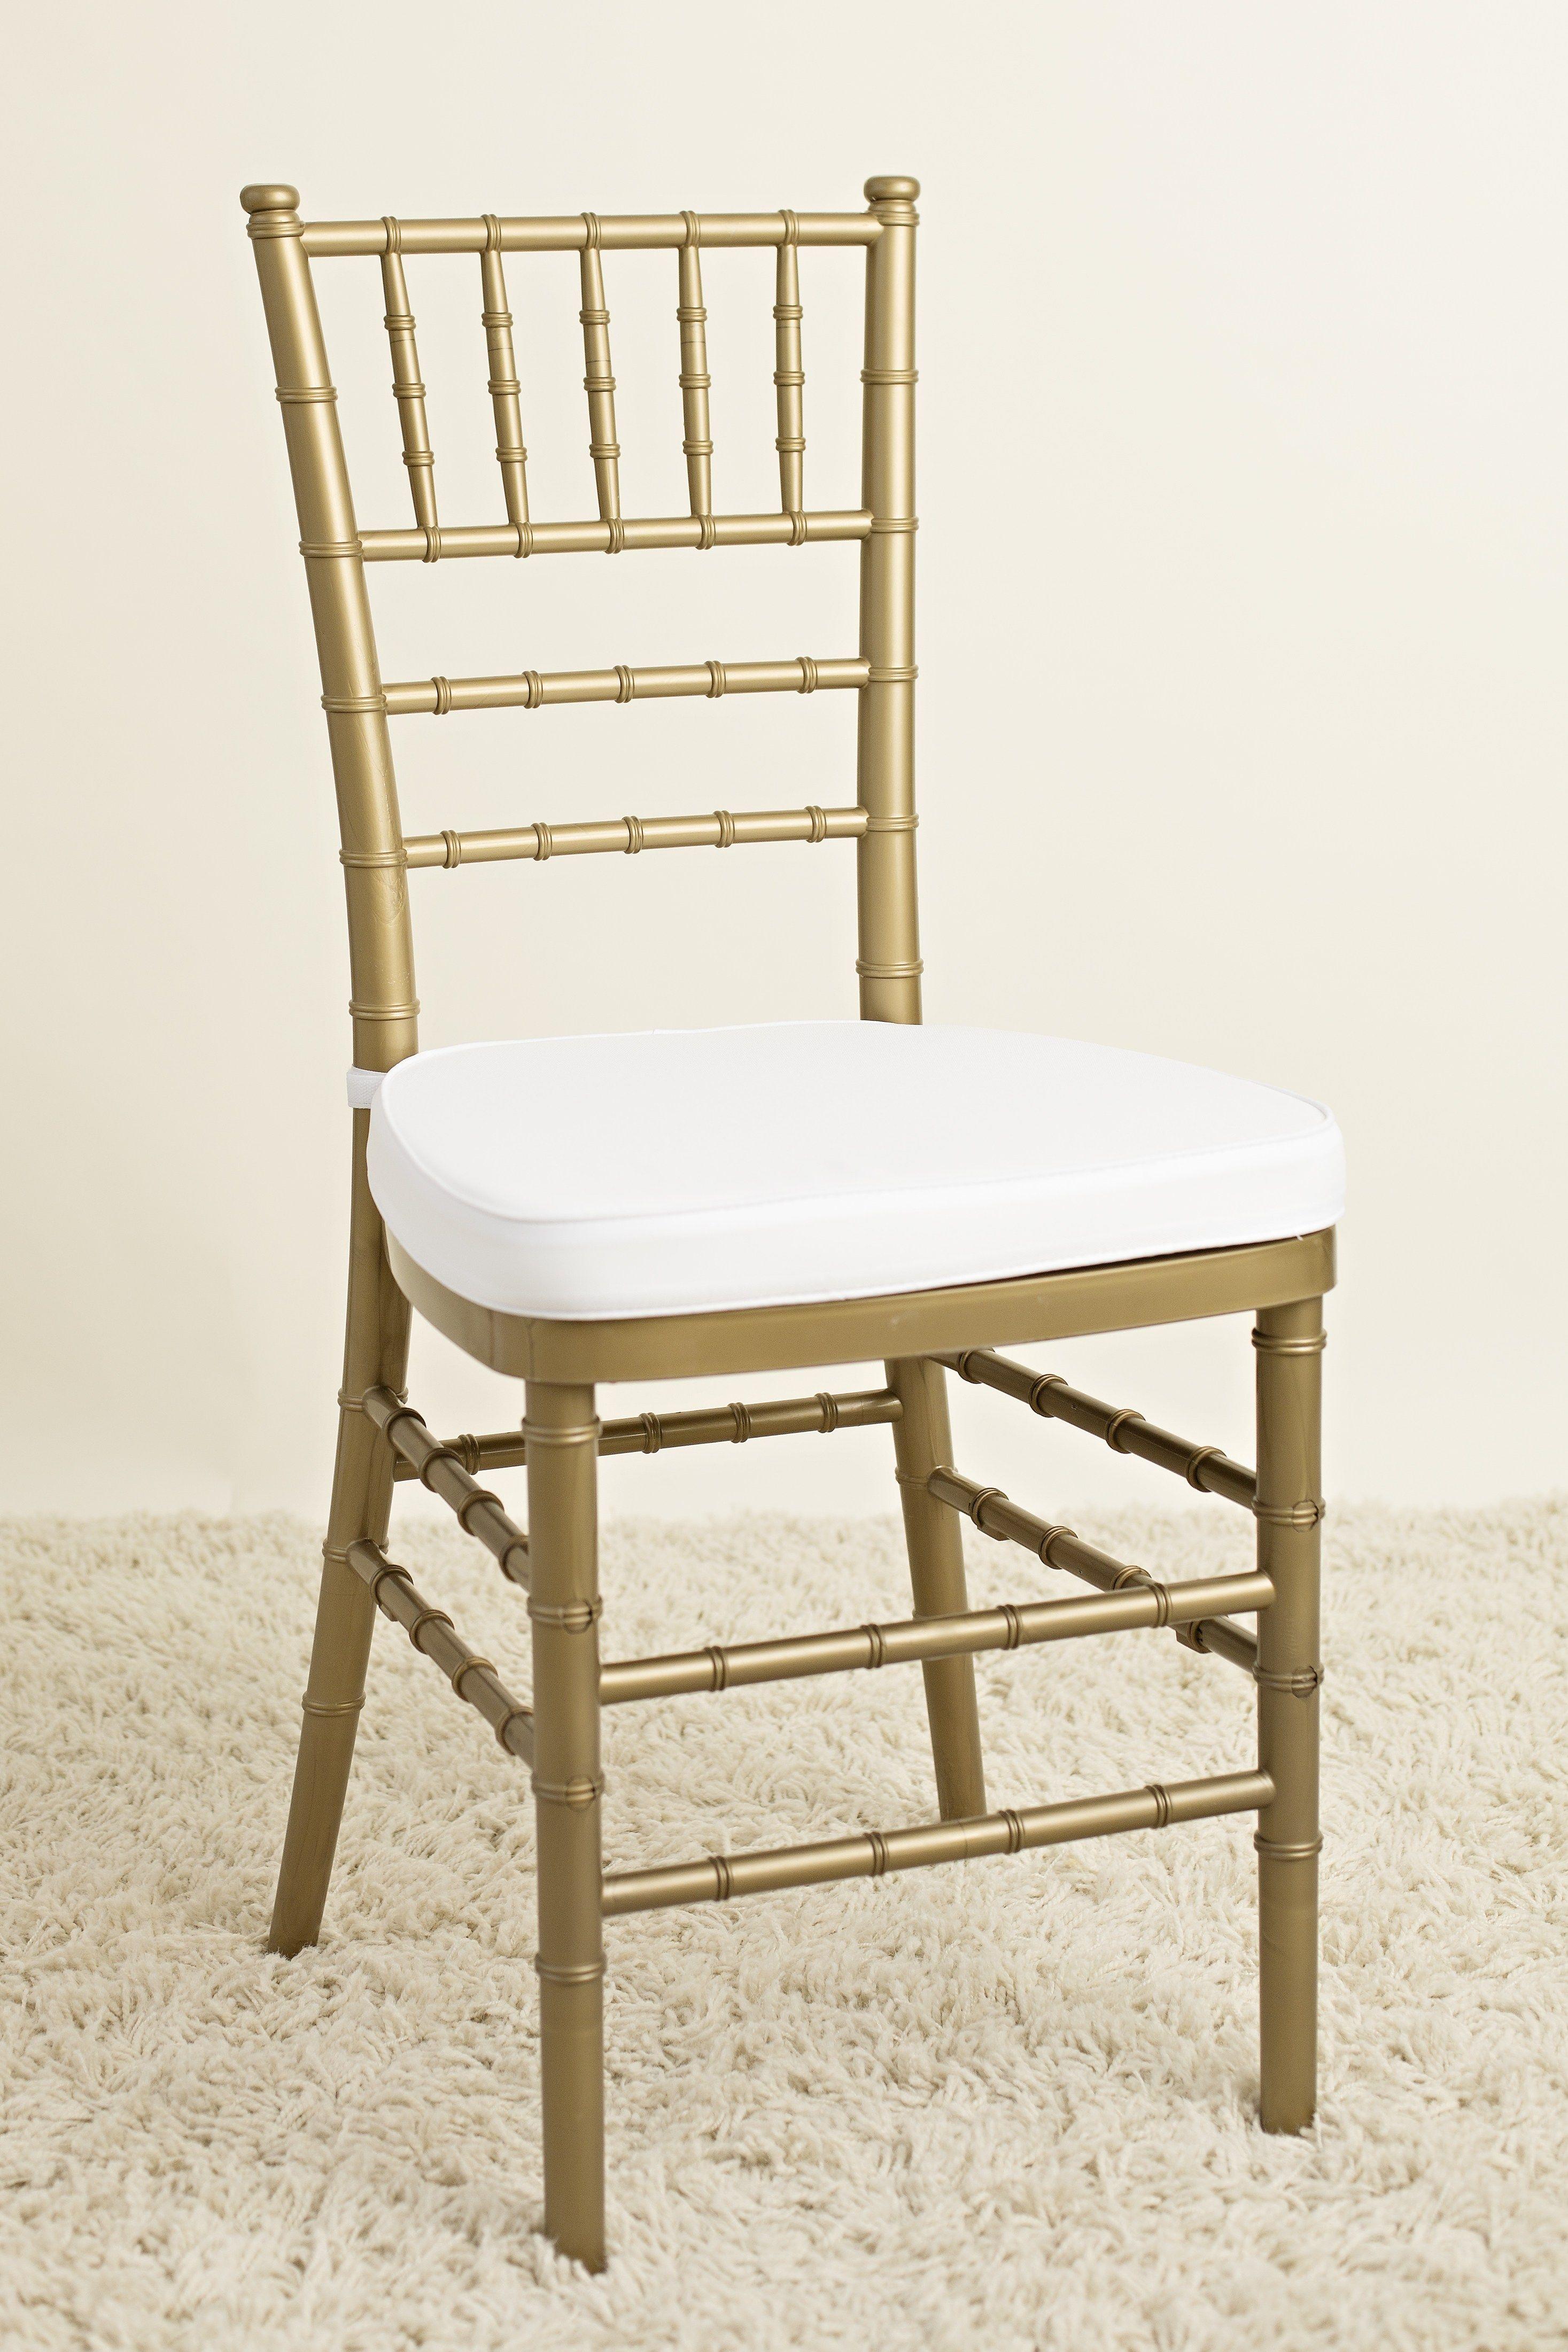 Chiavari tiffany chair gold the pretty prop shop